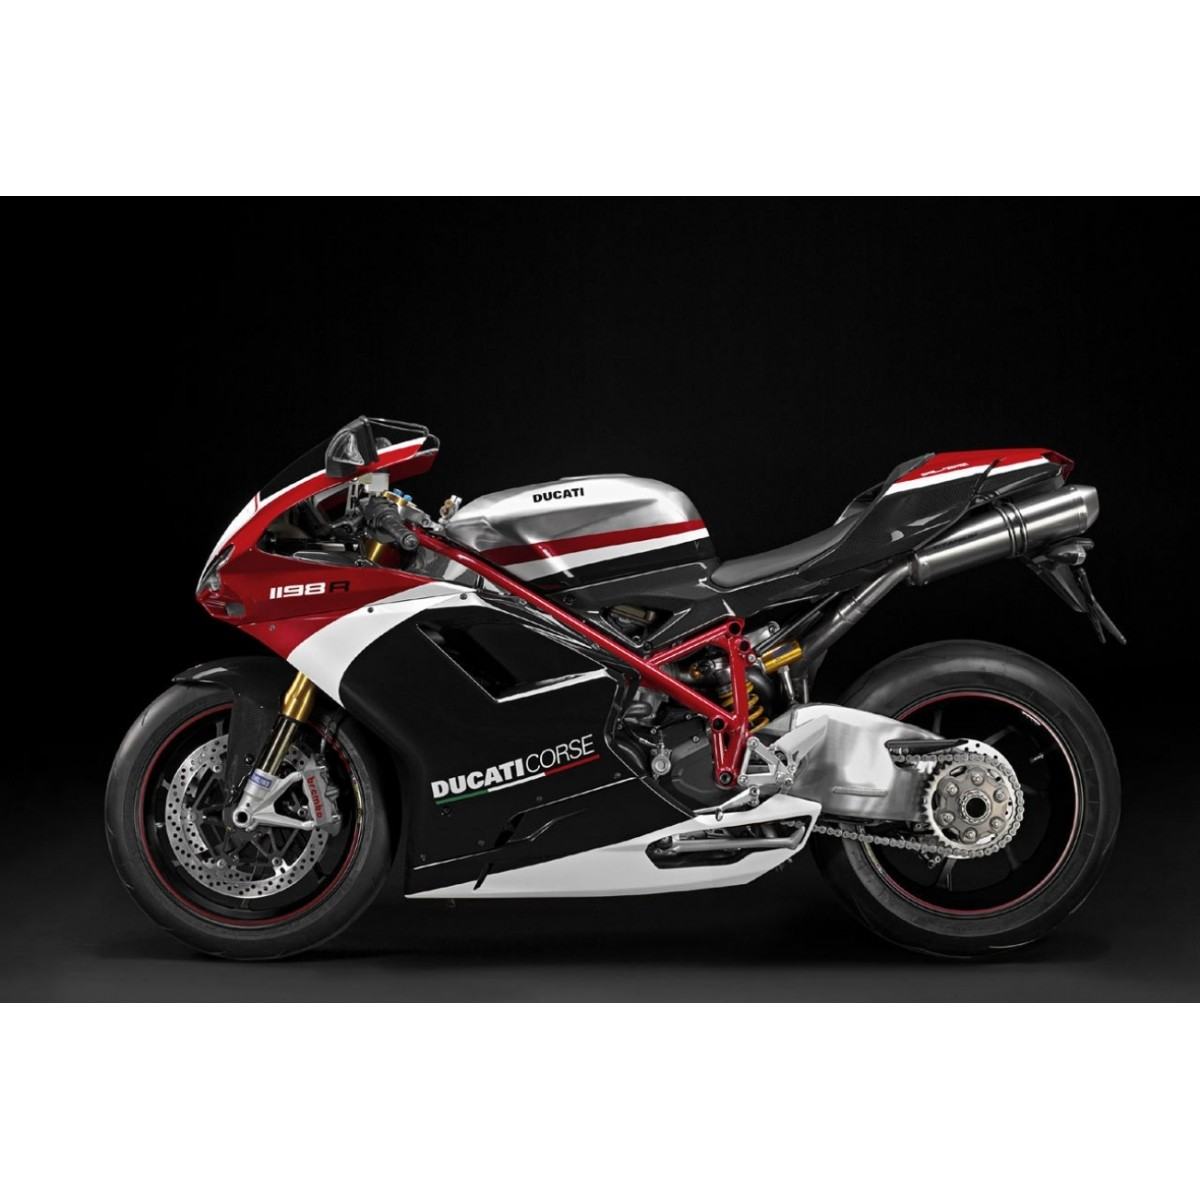 Kit Adesivos Ducati Corse 1198r Decalx